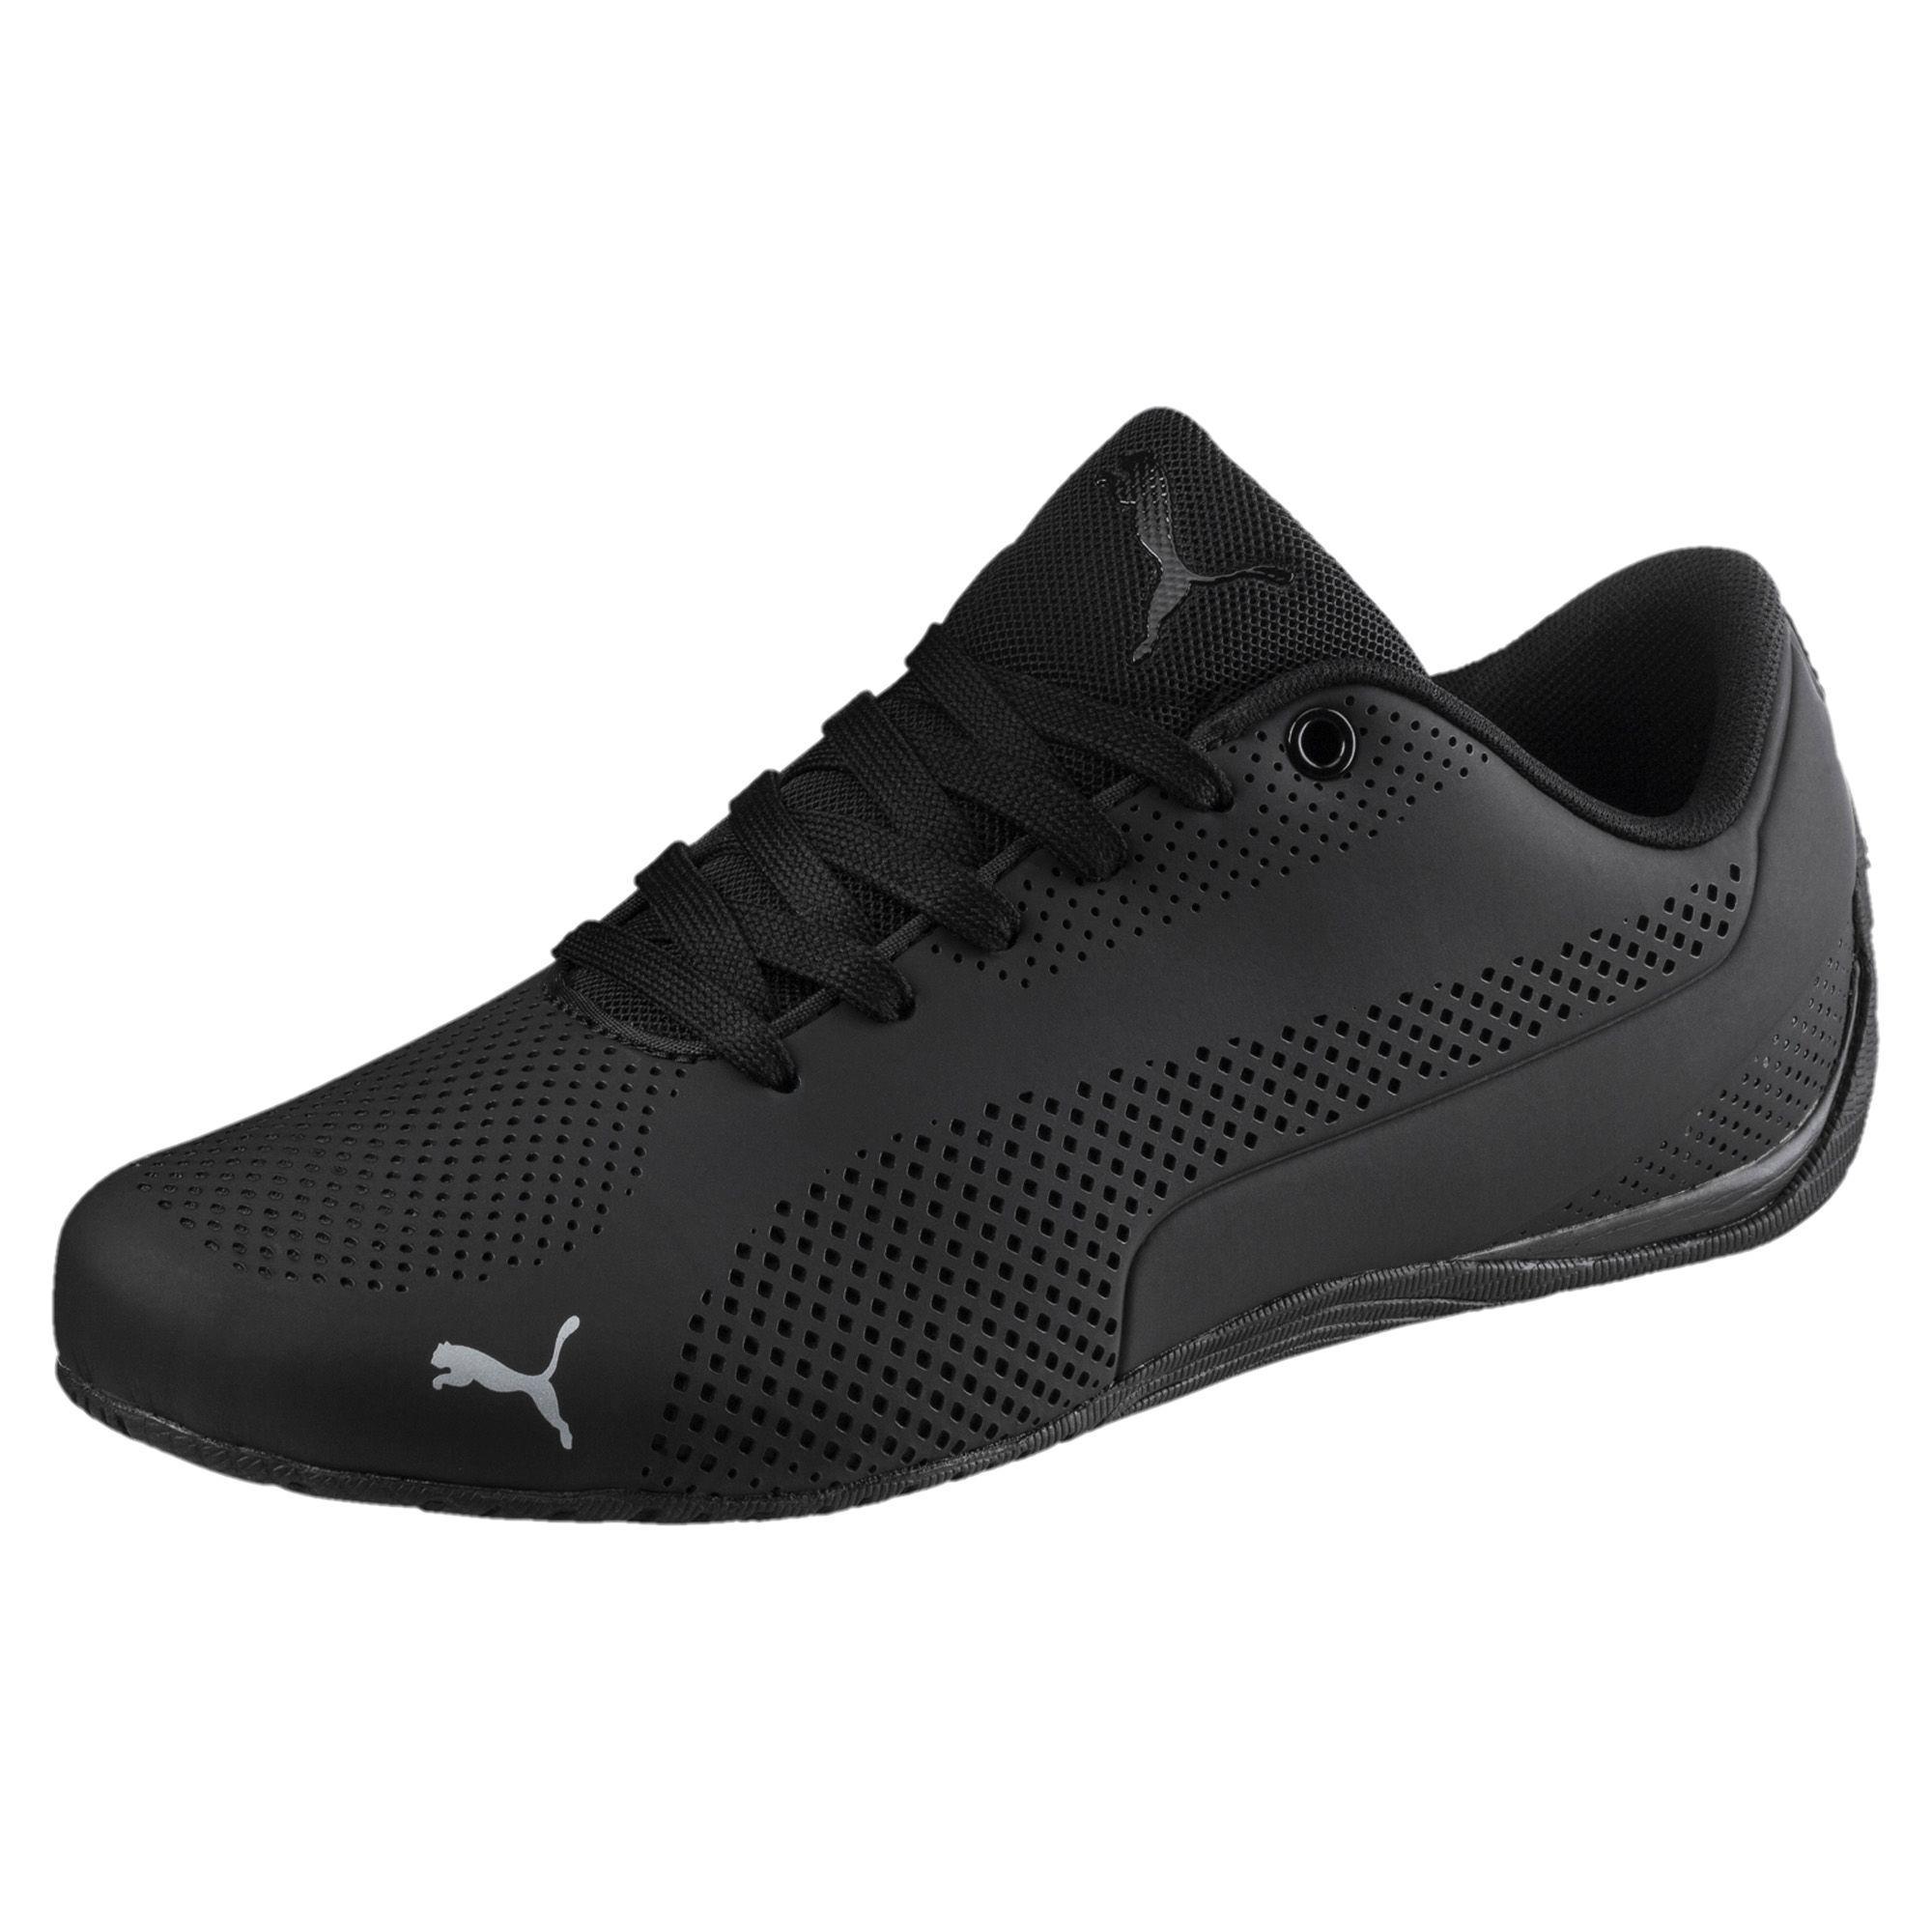 11a2b99458d4 Lyst - PUMA Drift Cat Ultra Reflective Men s Shoes in Black for Men ...